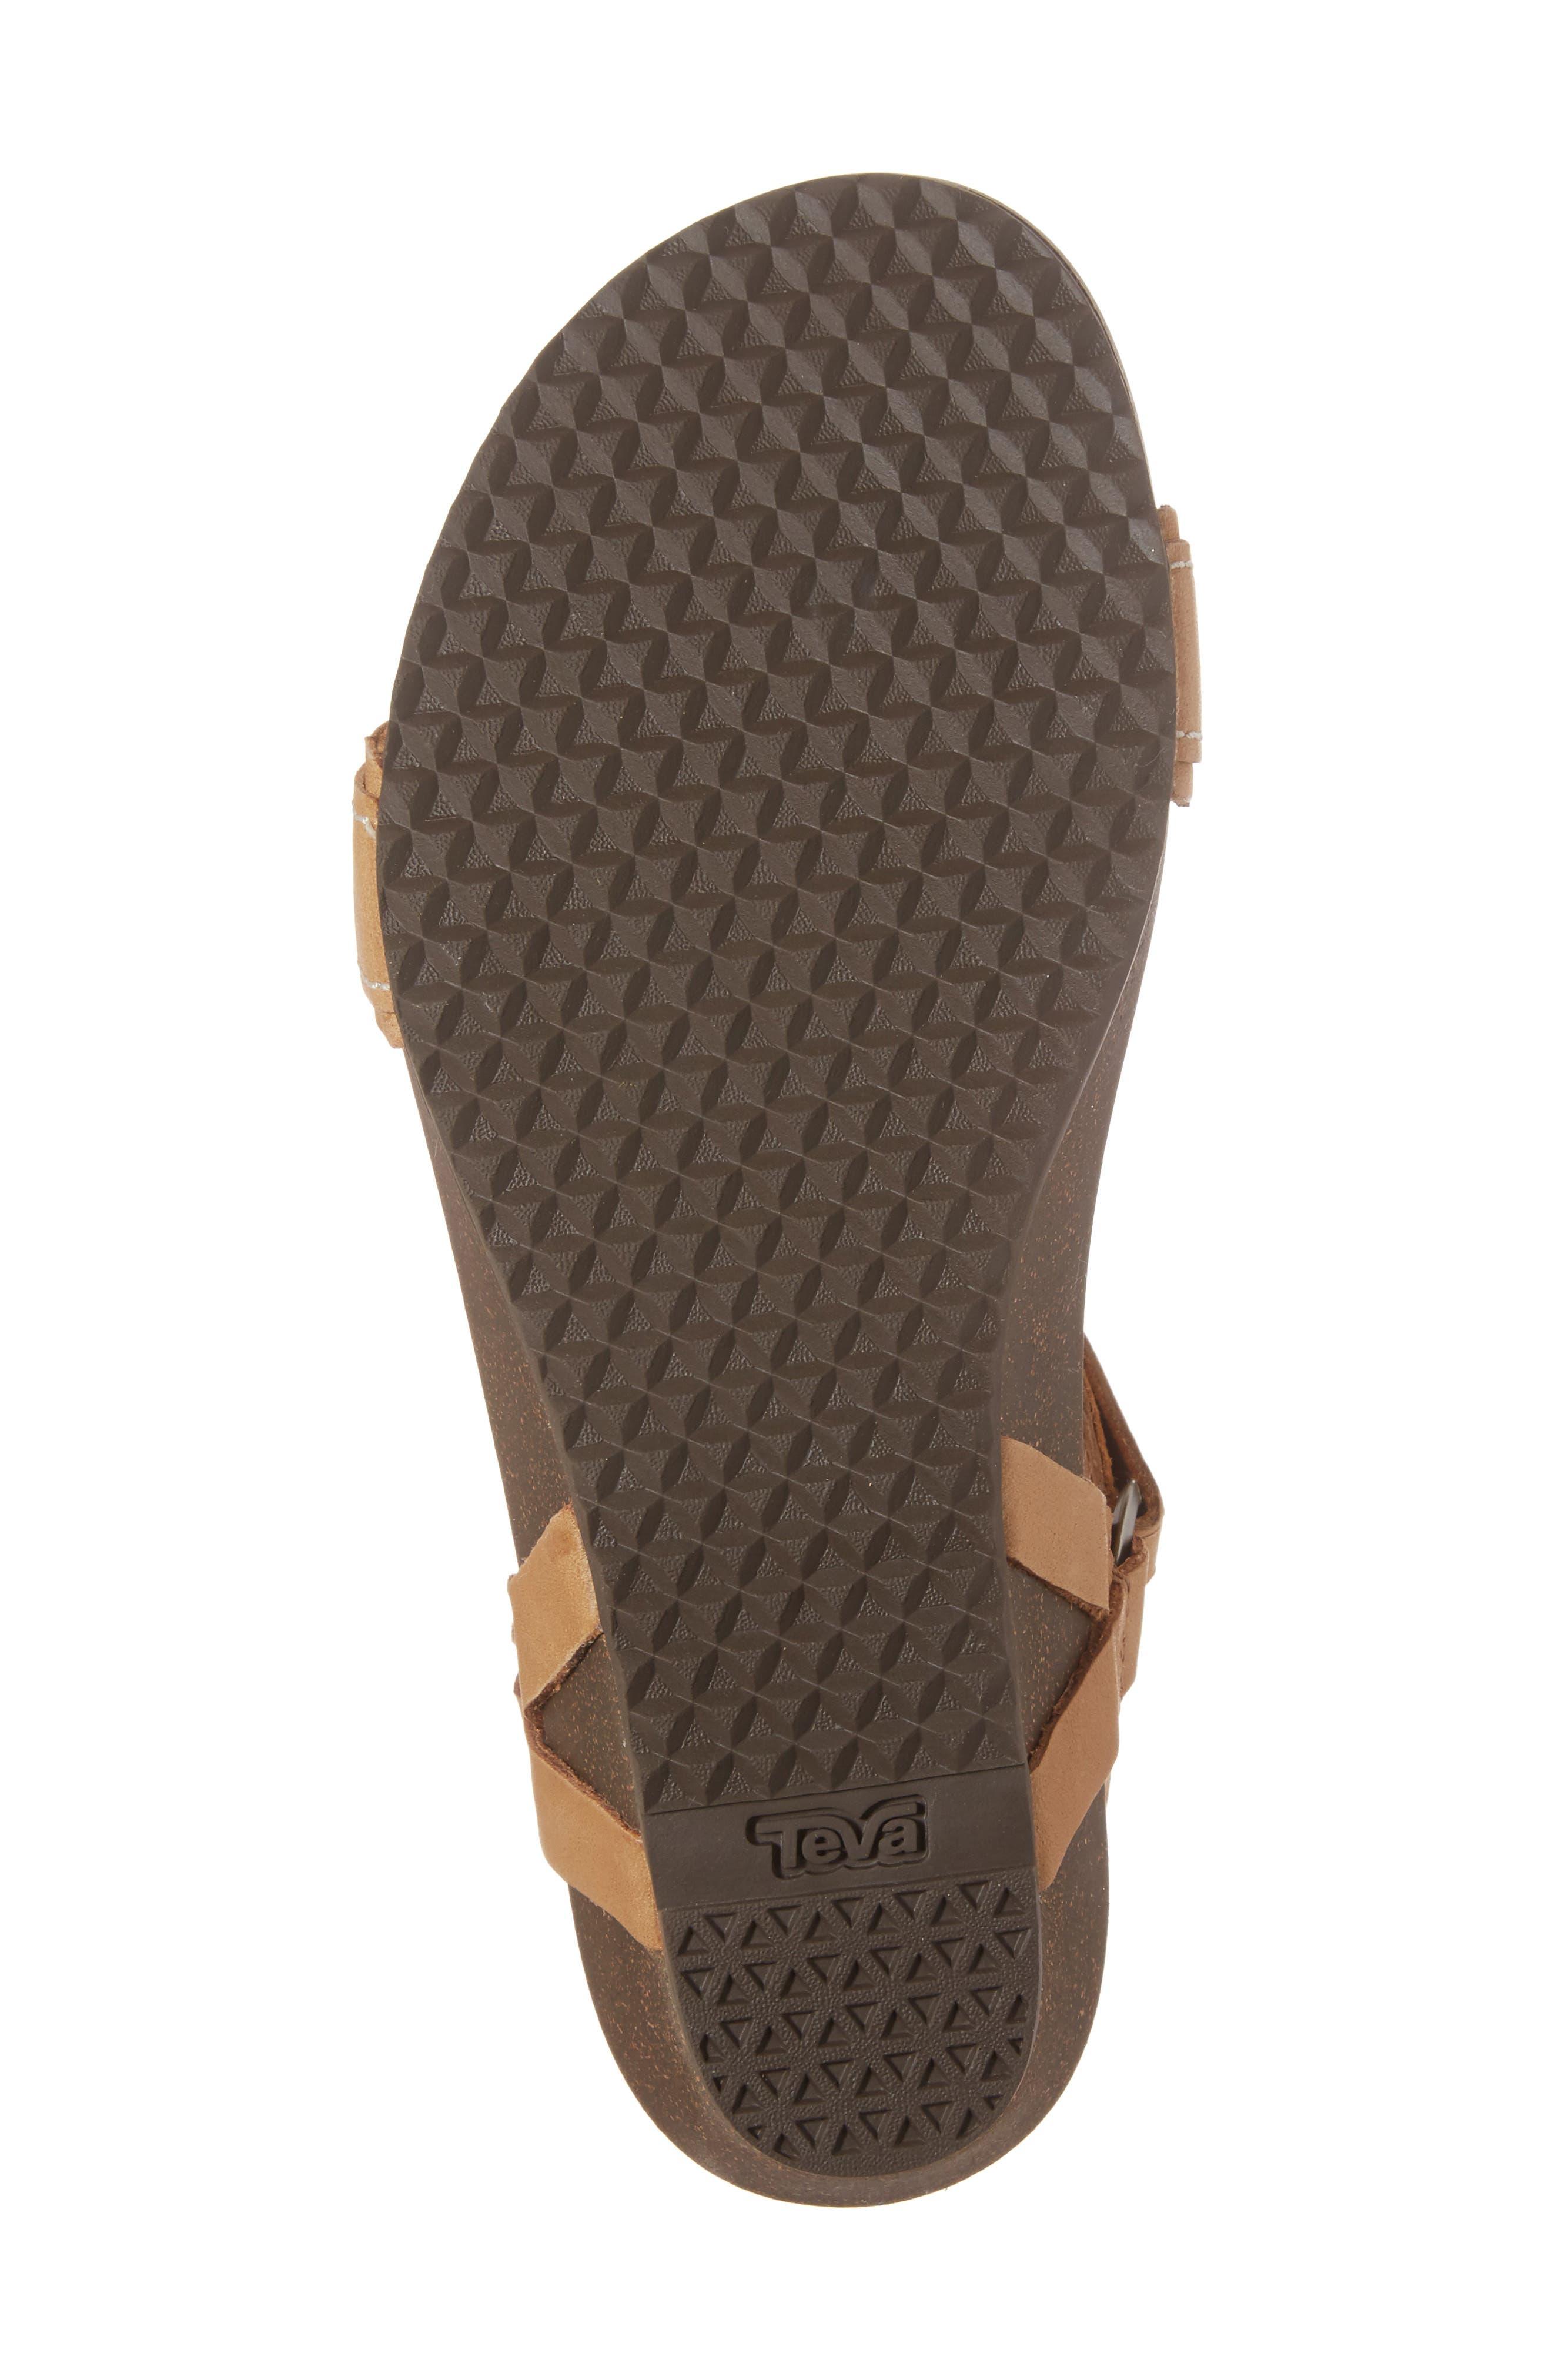 Ysidro Stitch Sandal,                             Alternate thumbnail 6, color,                             Tan Leather